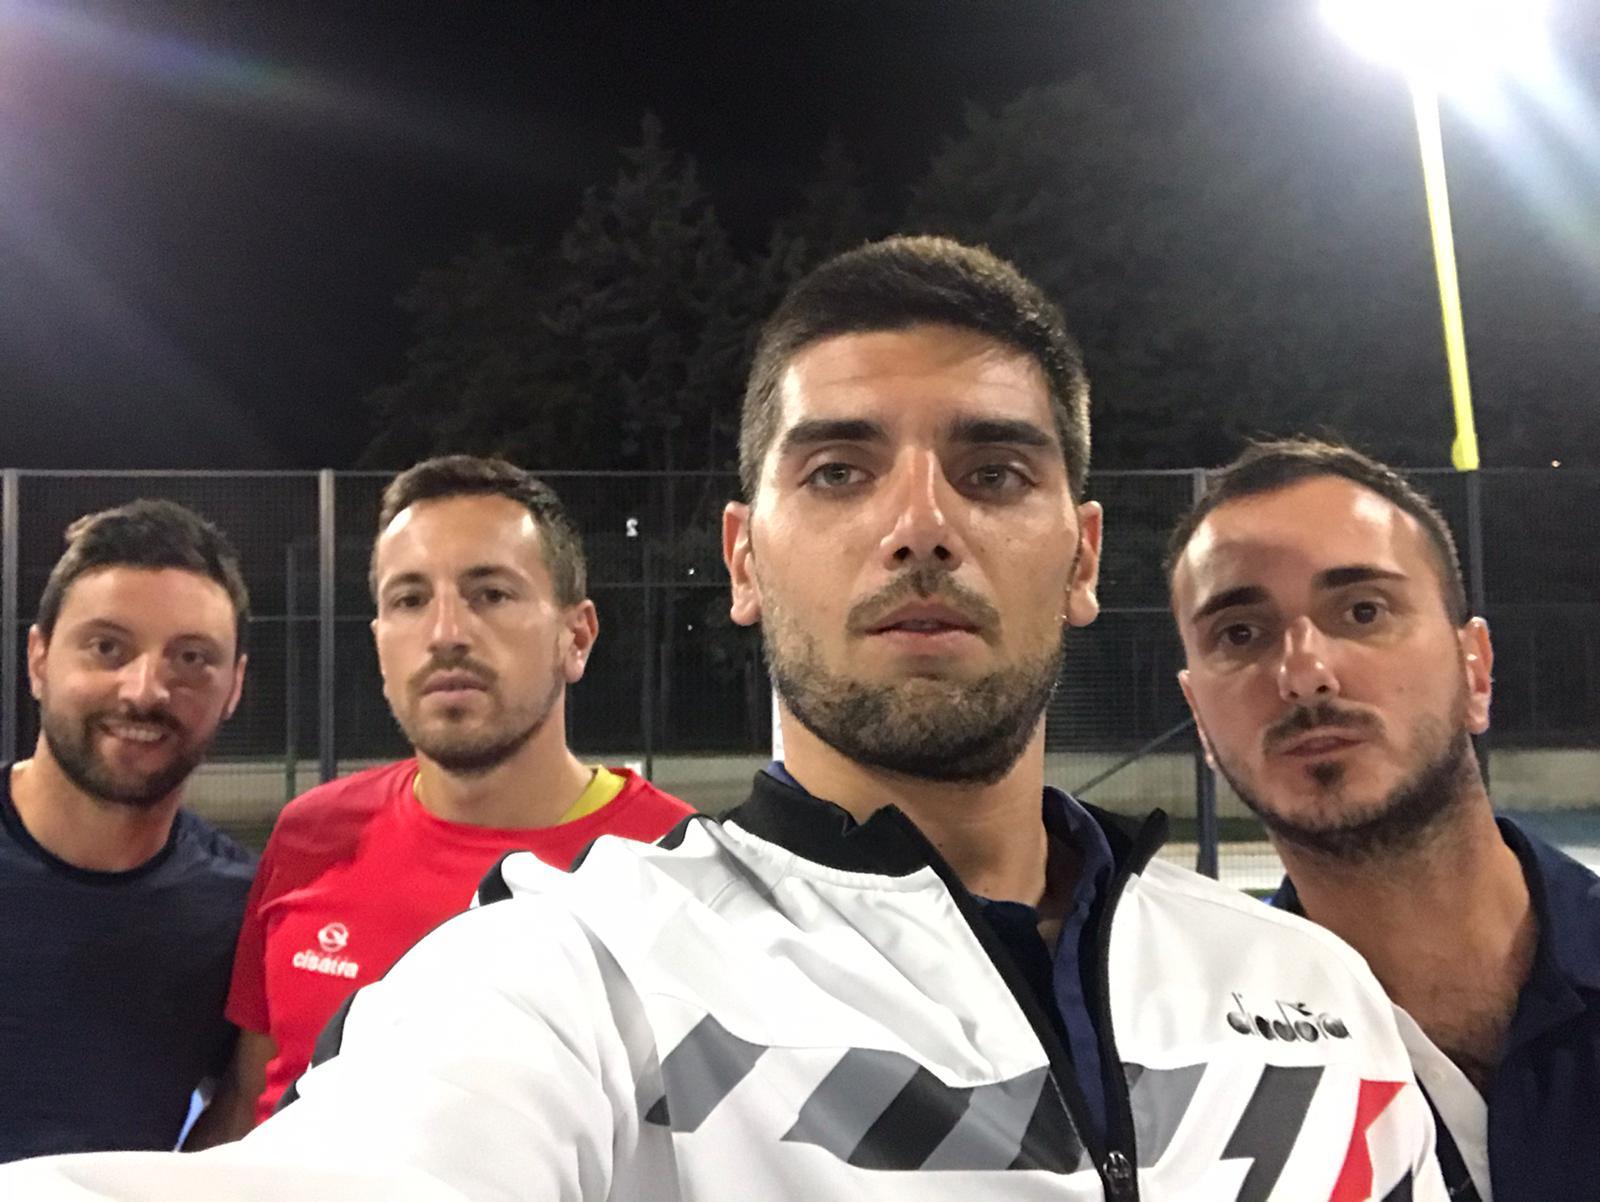 Play Pisana 2^ giornata: Pappata/Stella vs Ucci/Latini